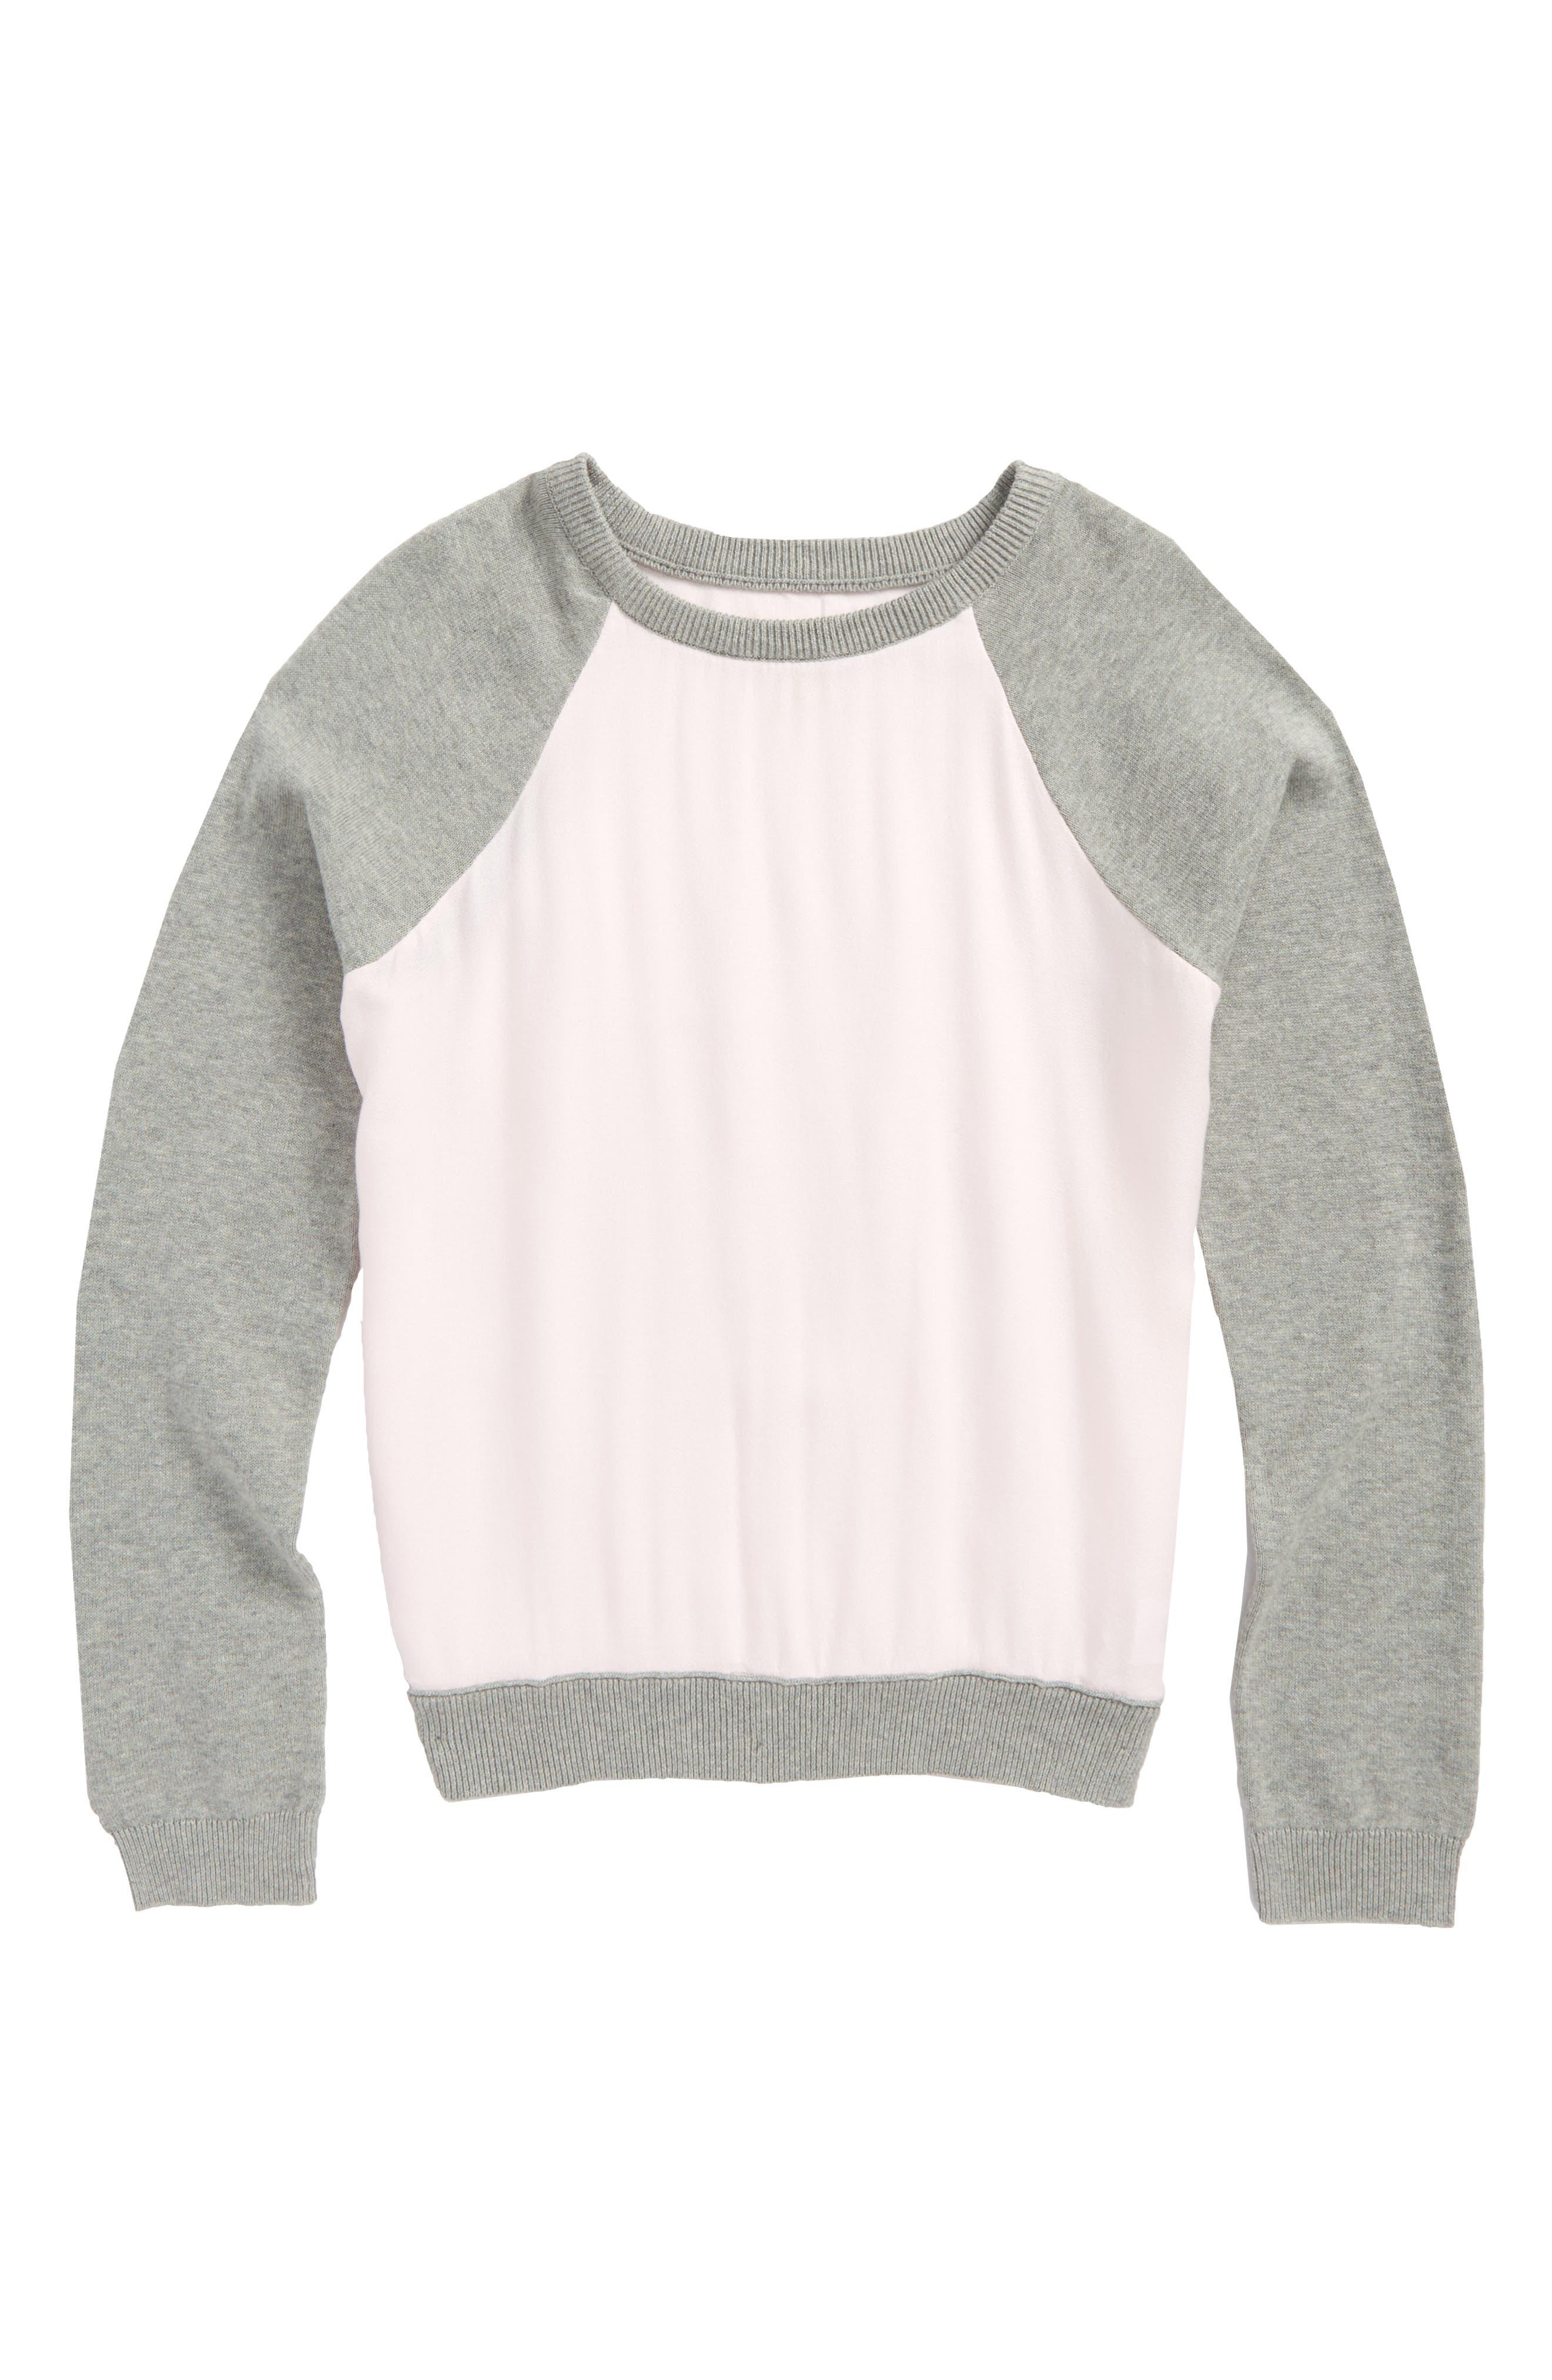 Tucker + Tate Knit to Woven Sweatshirt (Big Girls)